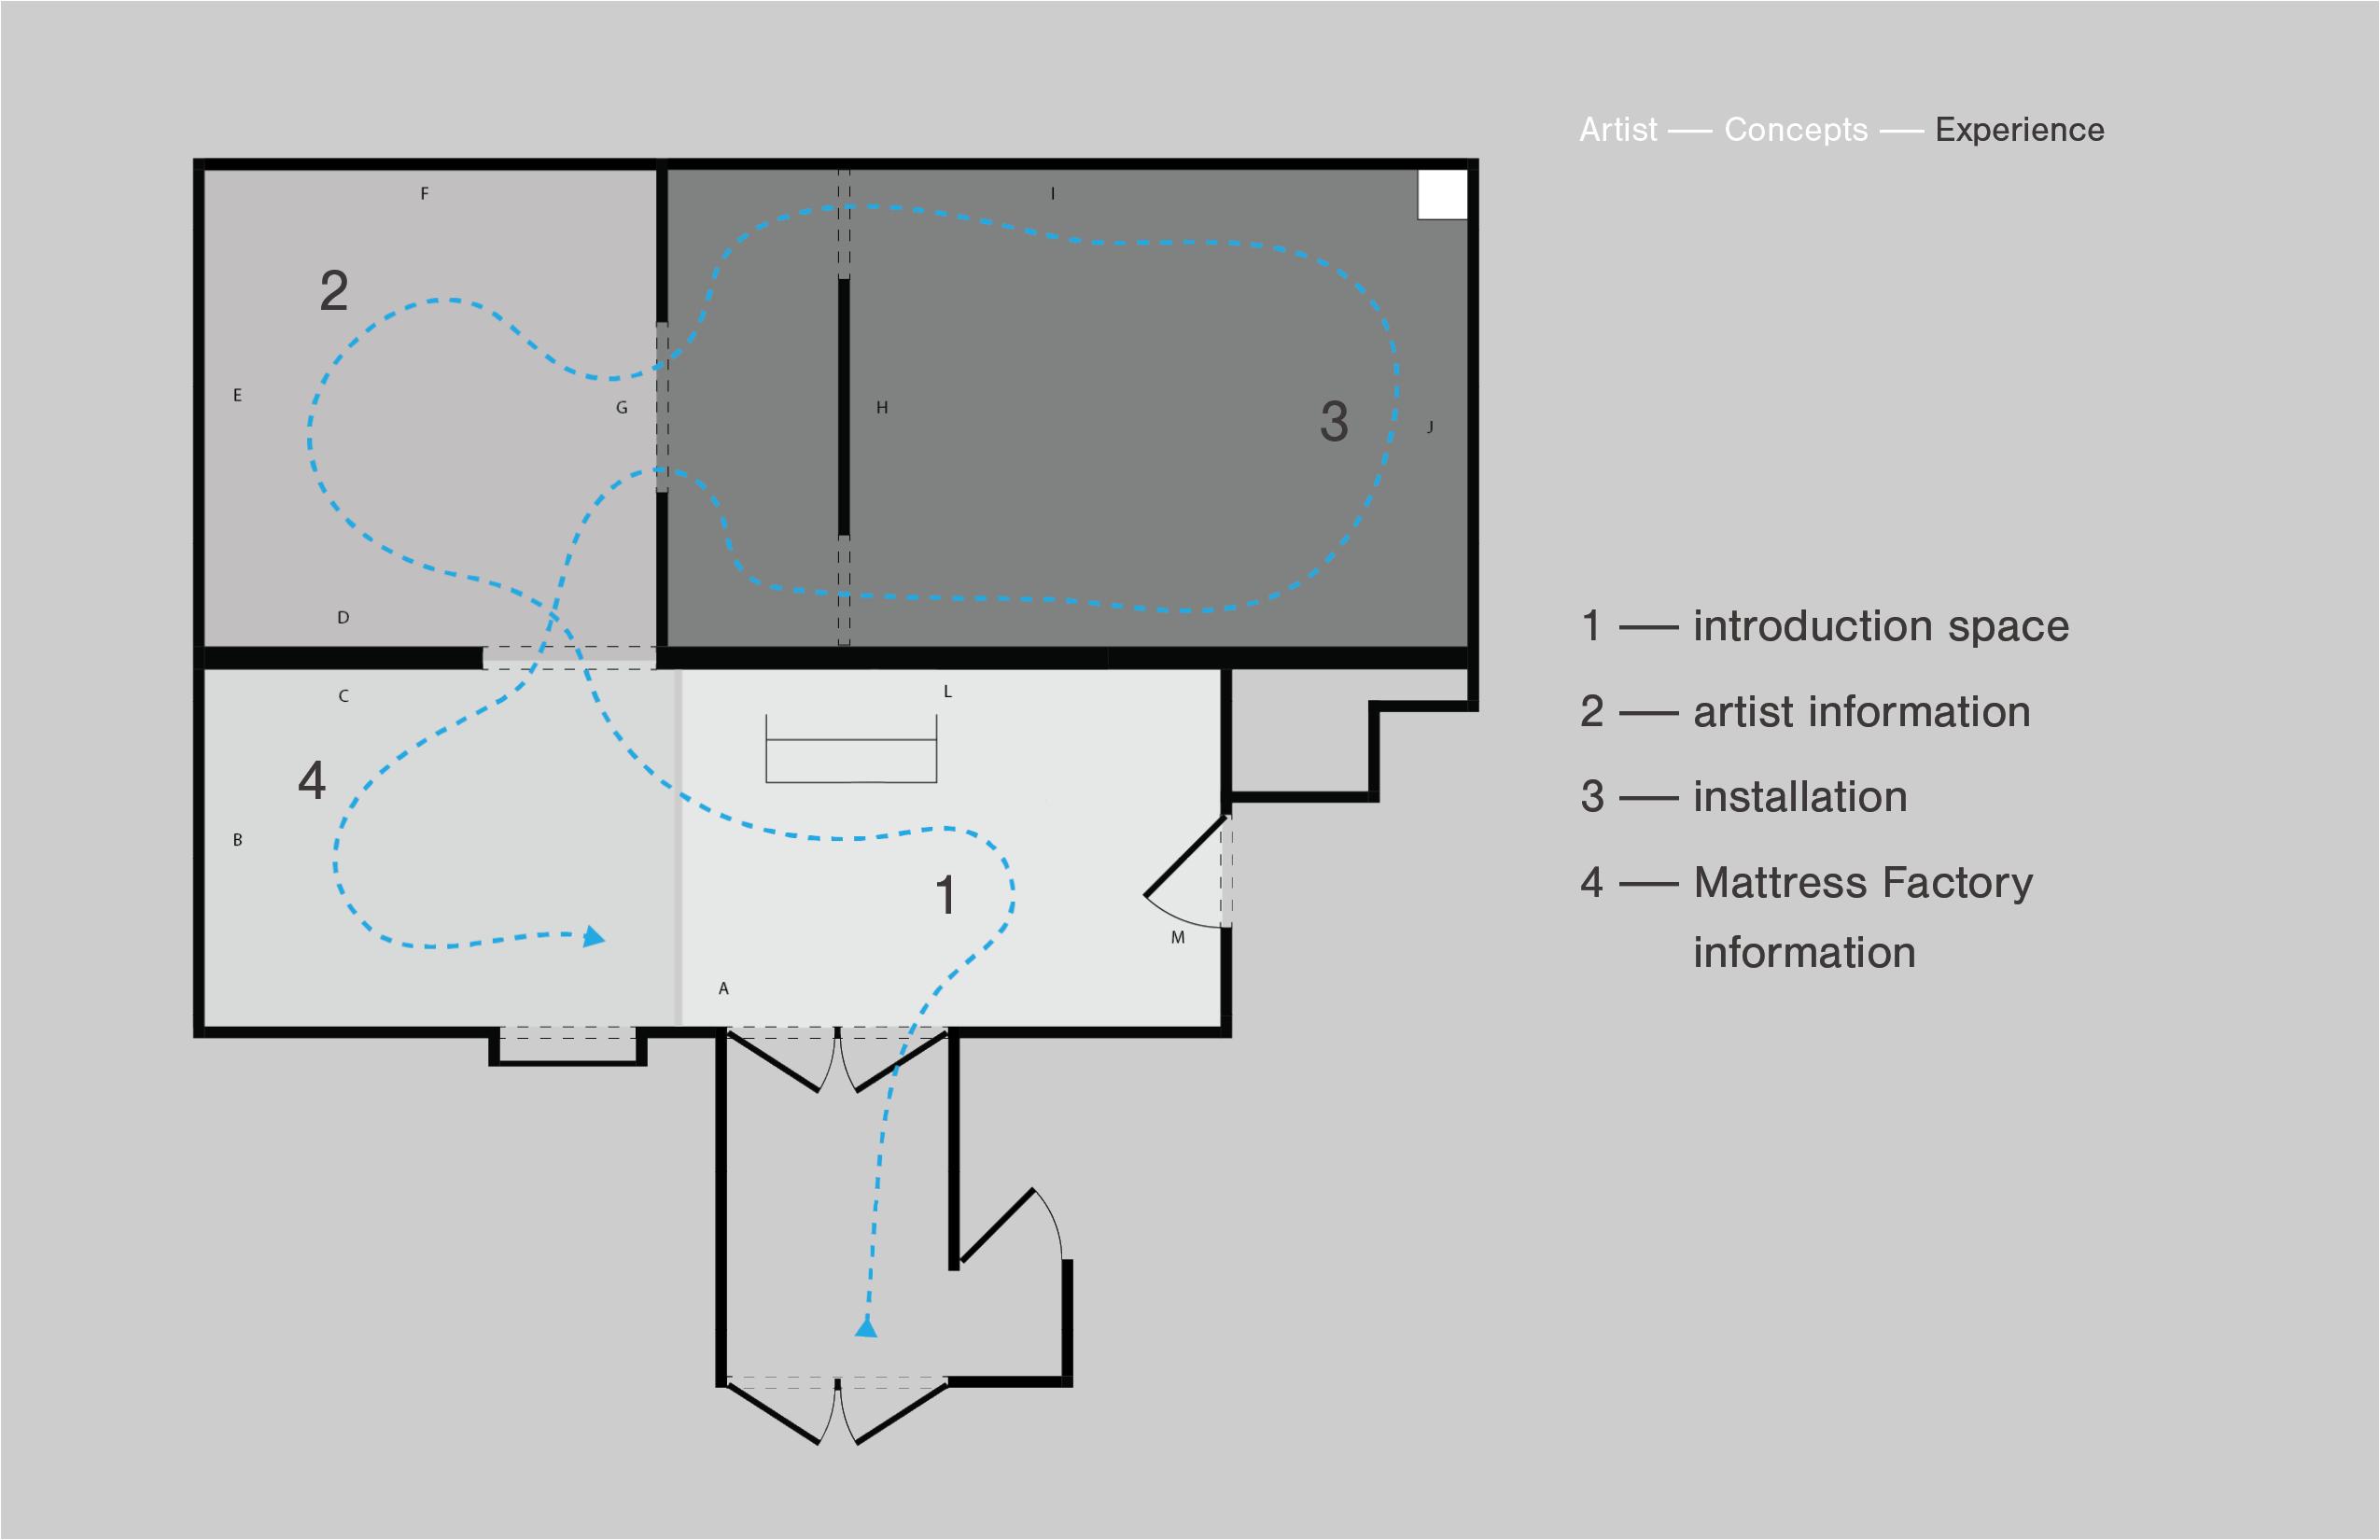 exhibit design project - parti diagram/ visitor journey